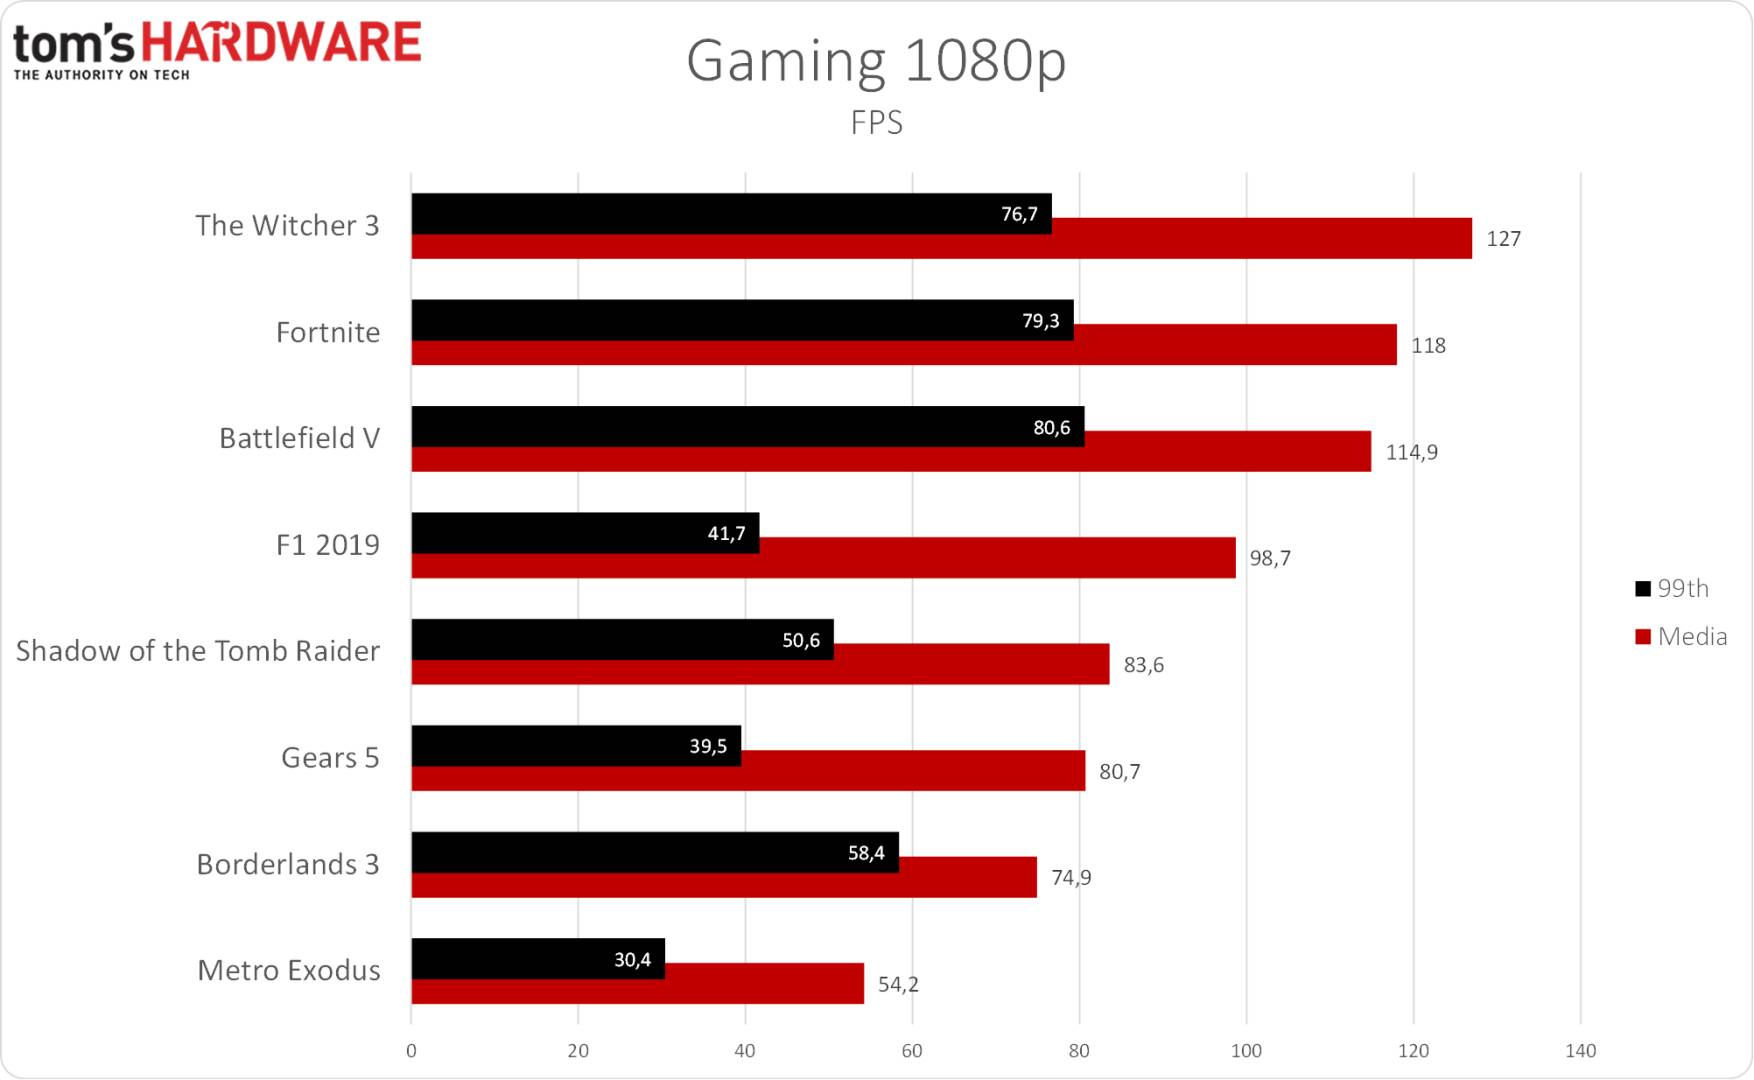 Eurocom Nightsky RX15 - Gaming 1080p